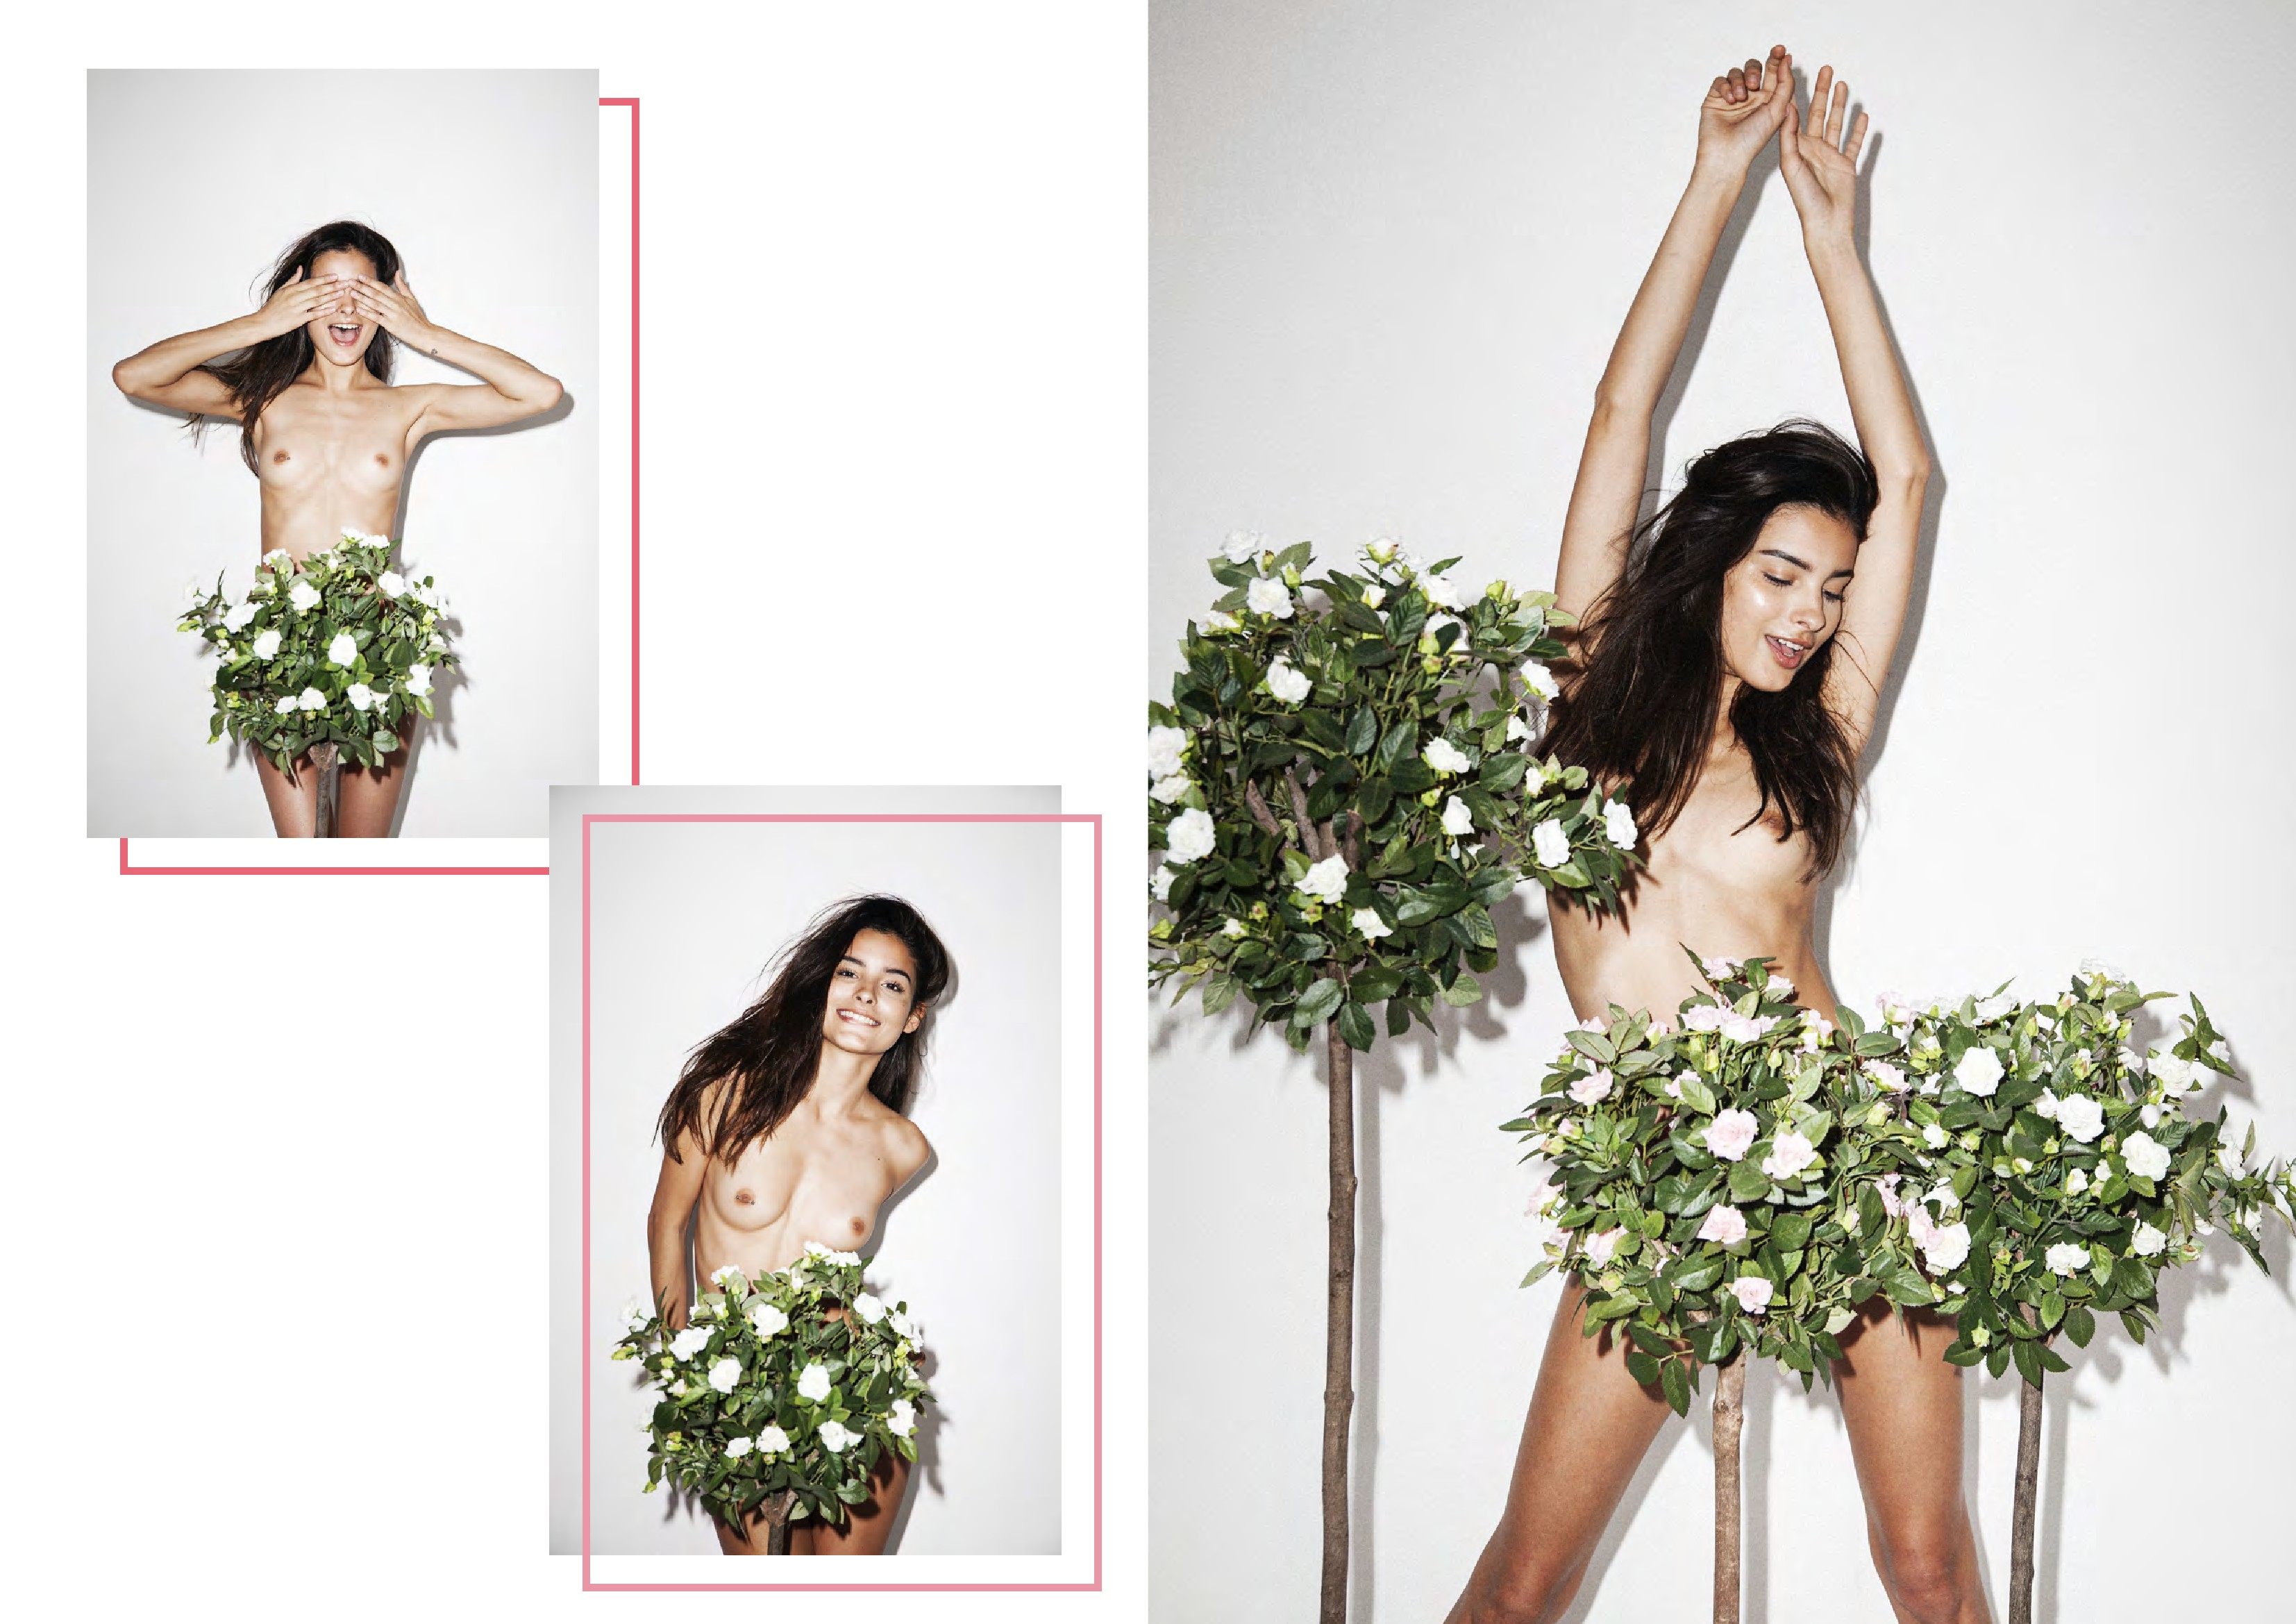 Sex Alyssa Miller nude photos 2019